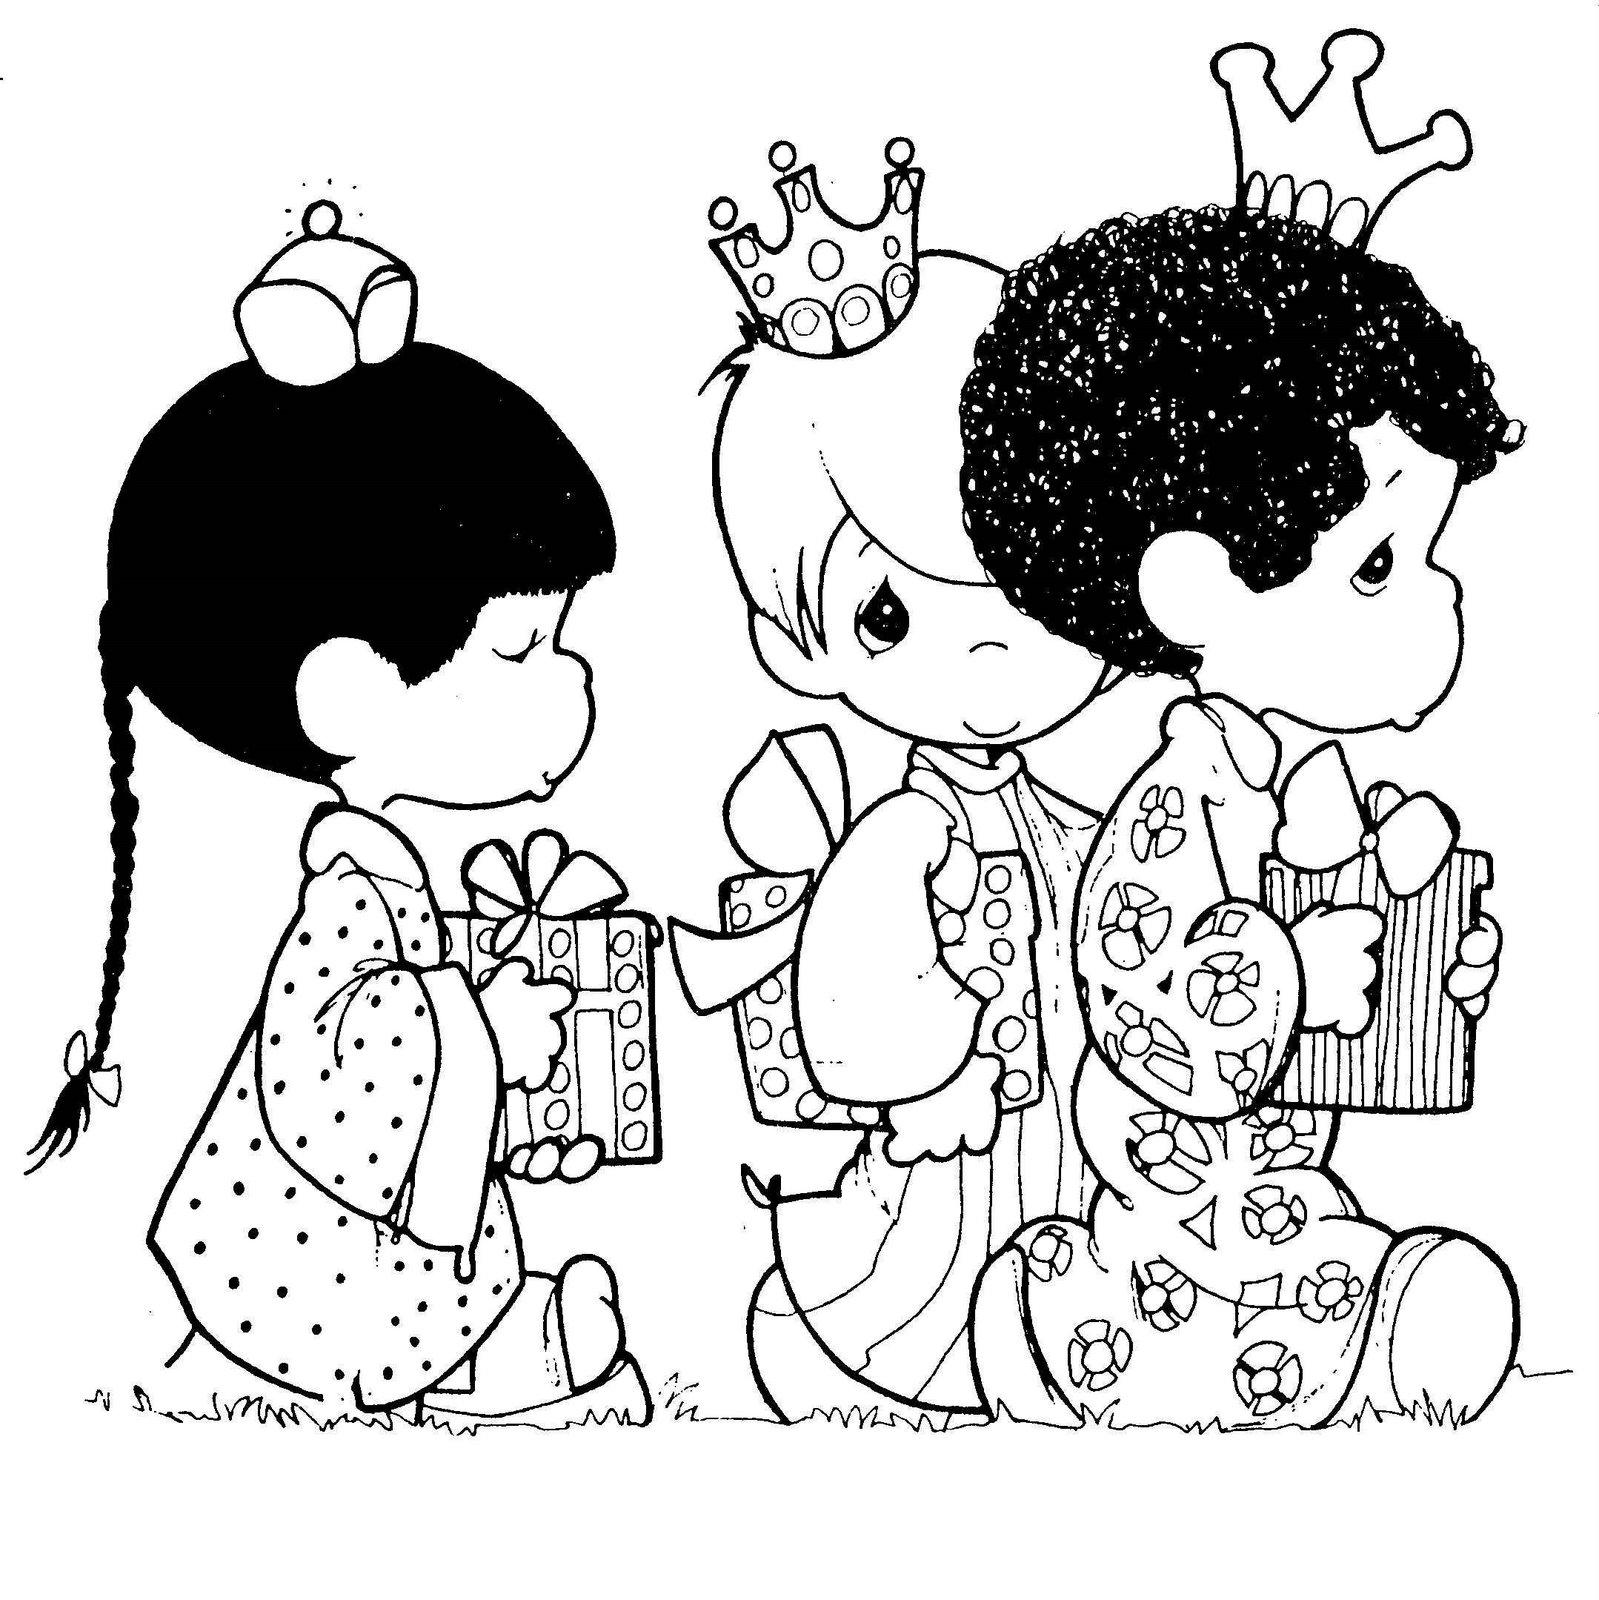 1599 x 1600 jpeg 363kB, Dibujo De Los Reyes Magos | New Calendar ...